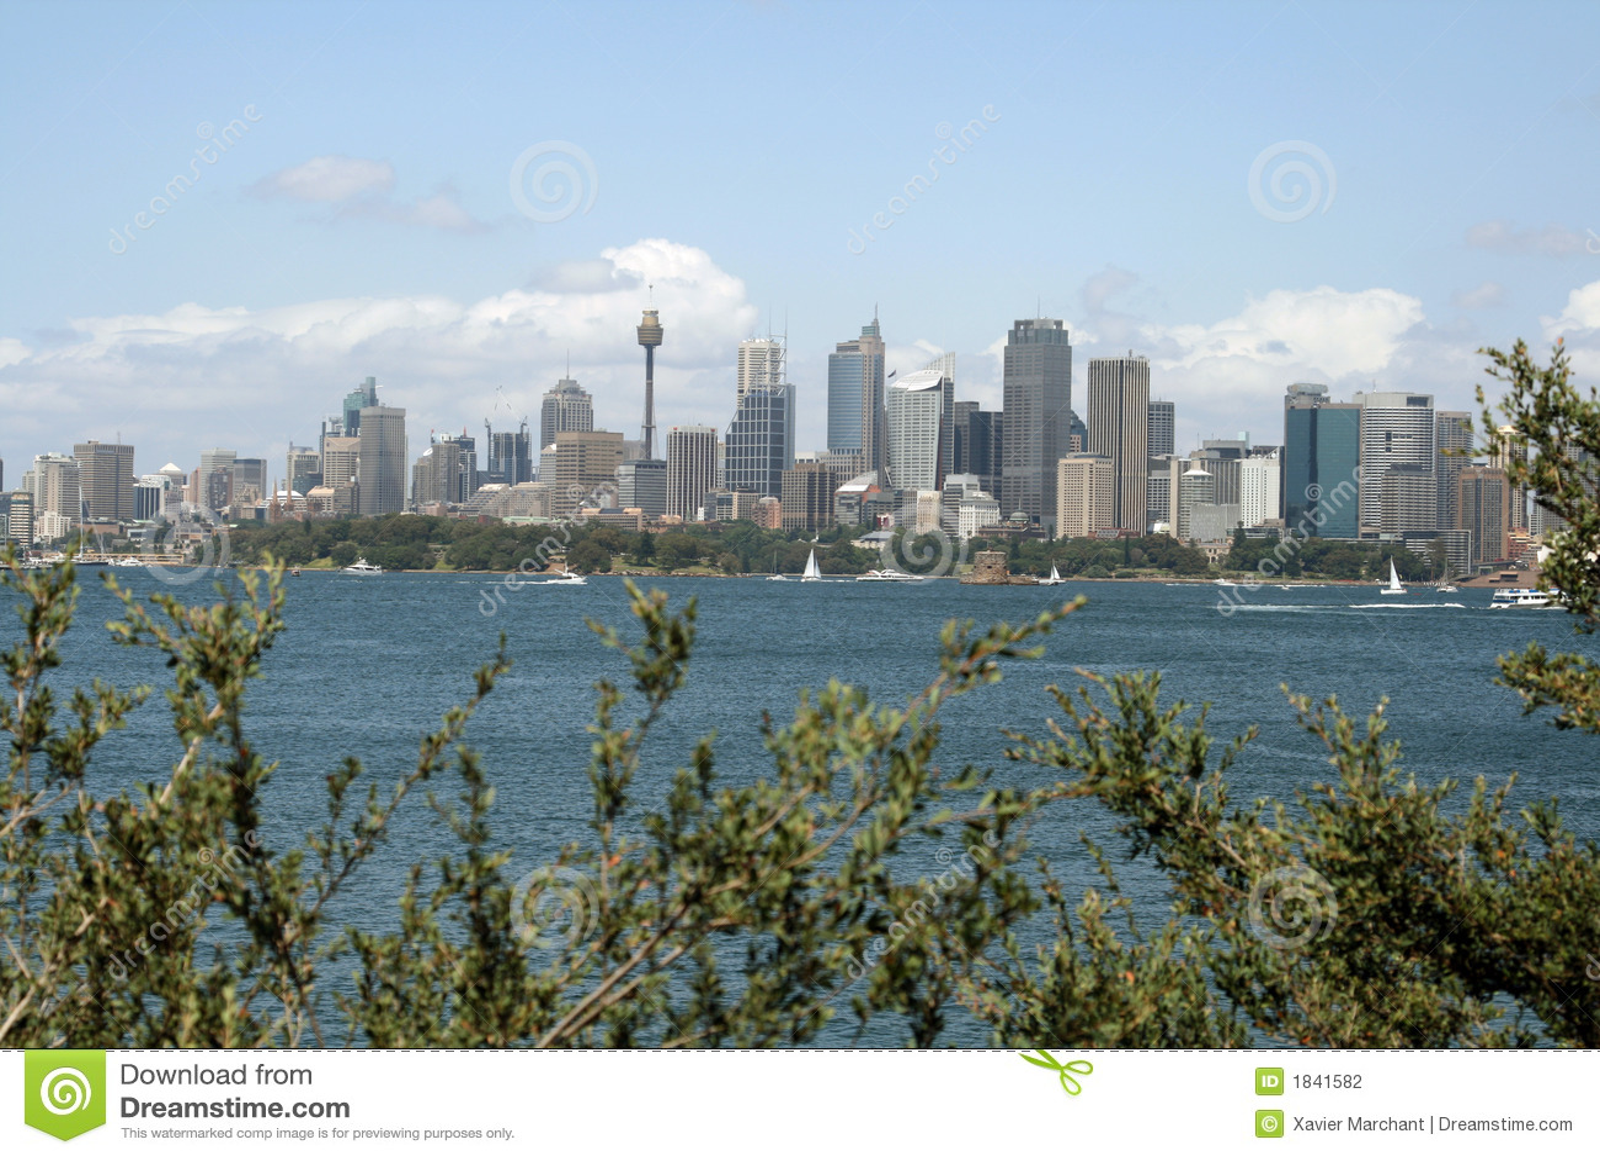 Sydney city landscape stock photography image 1841582 for Landscaping sydney